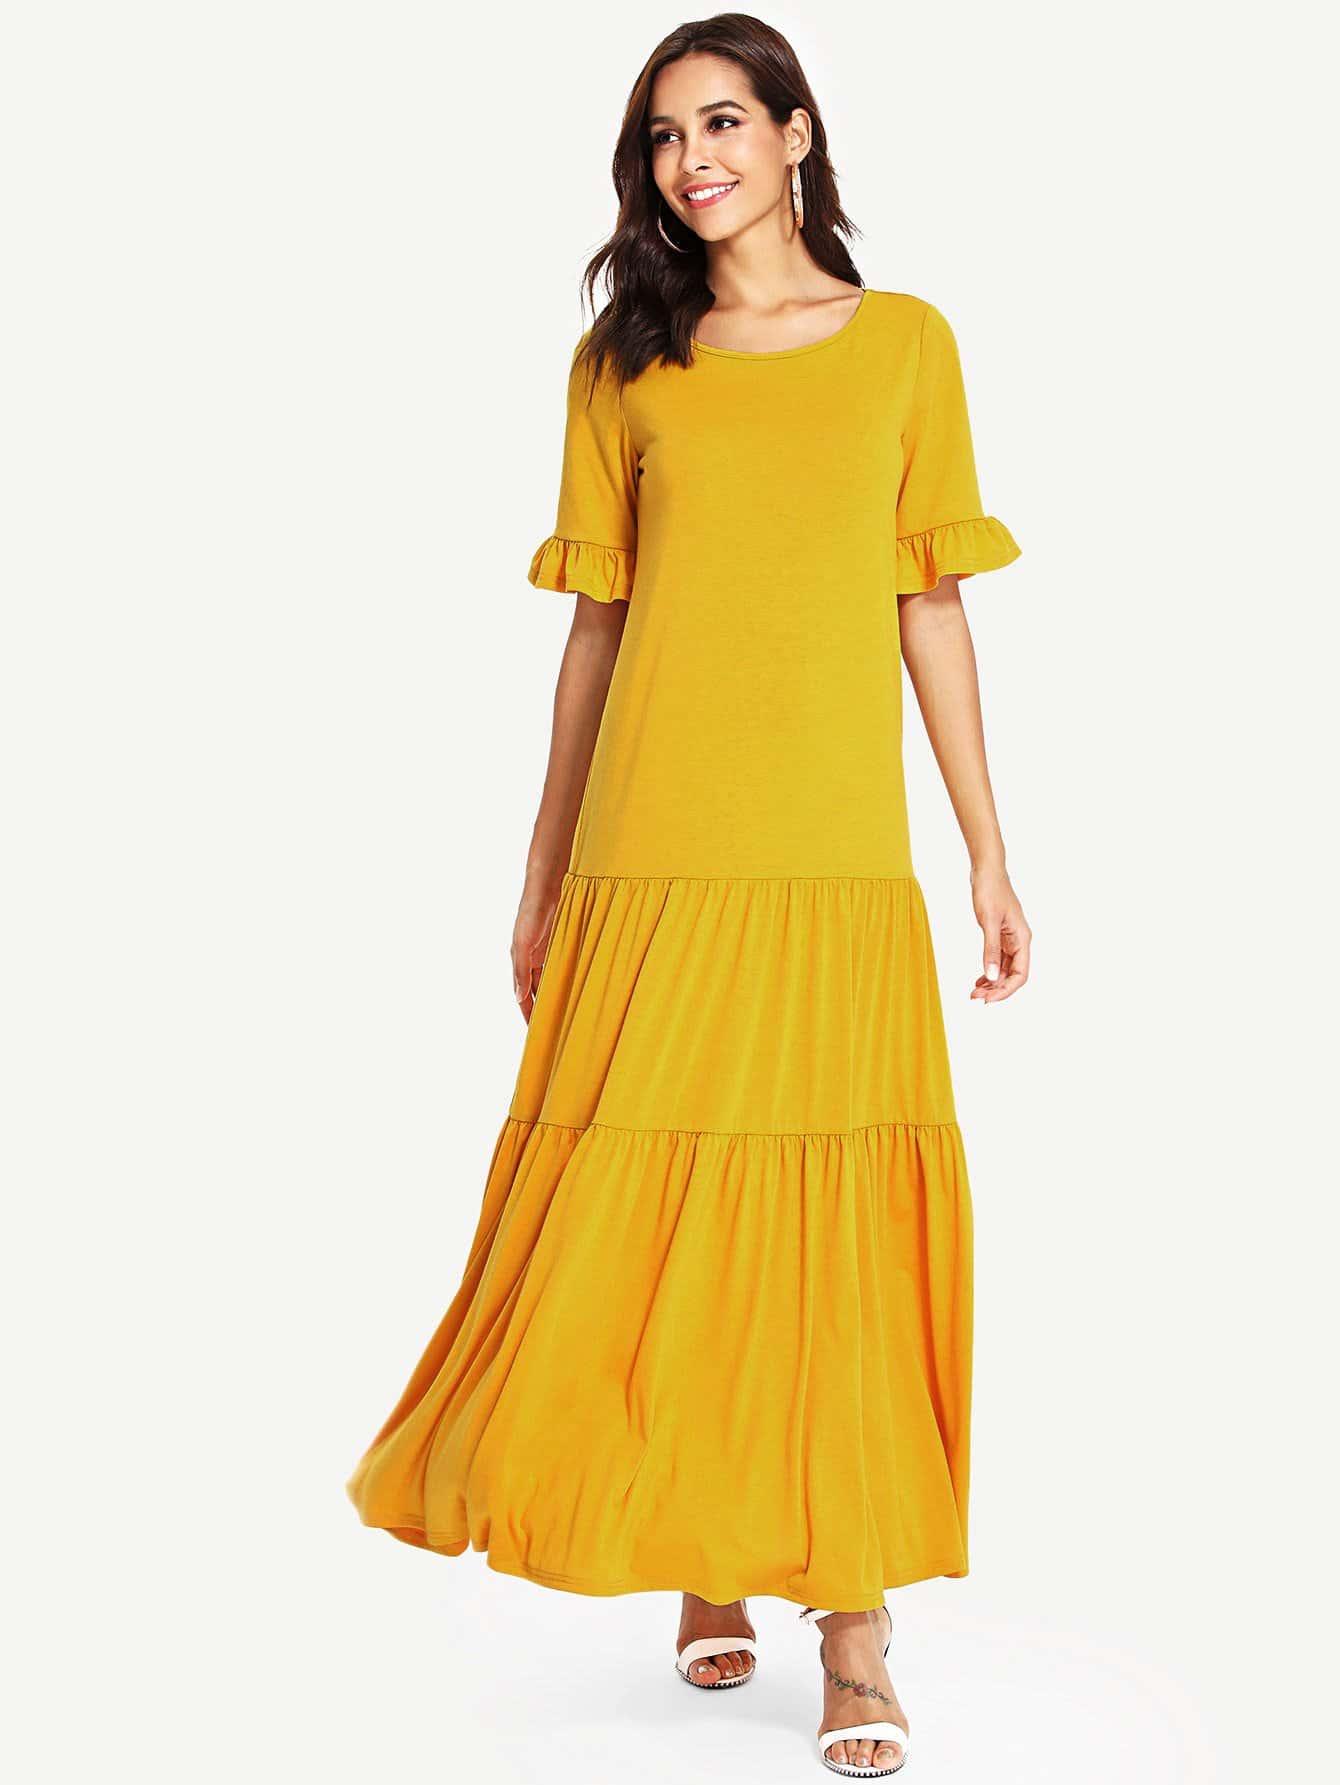 Ruffle Trim Solid Tiered Dress one side ruffle trim solid dress